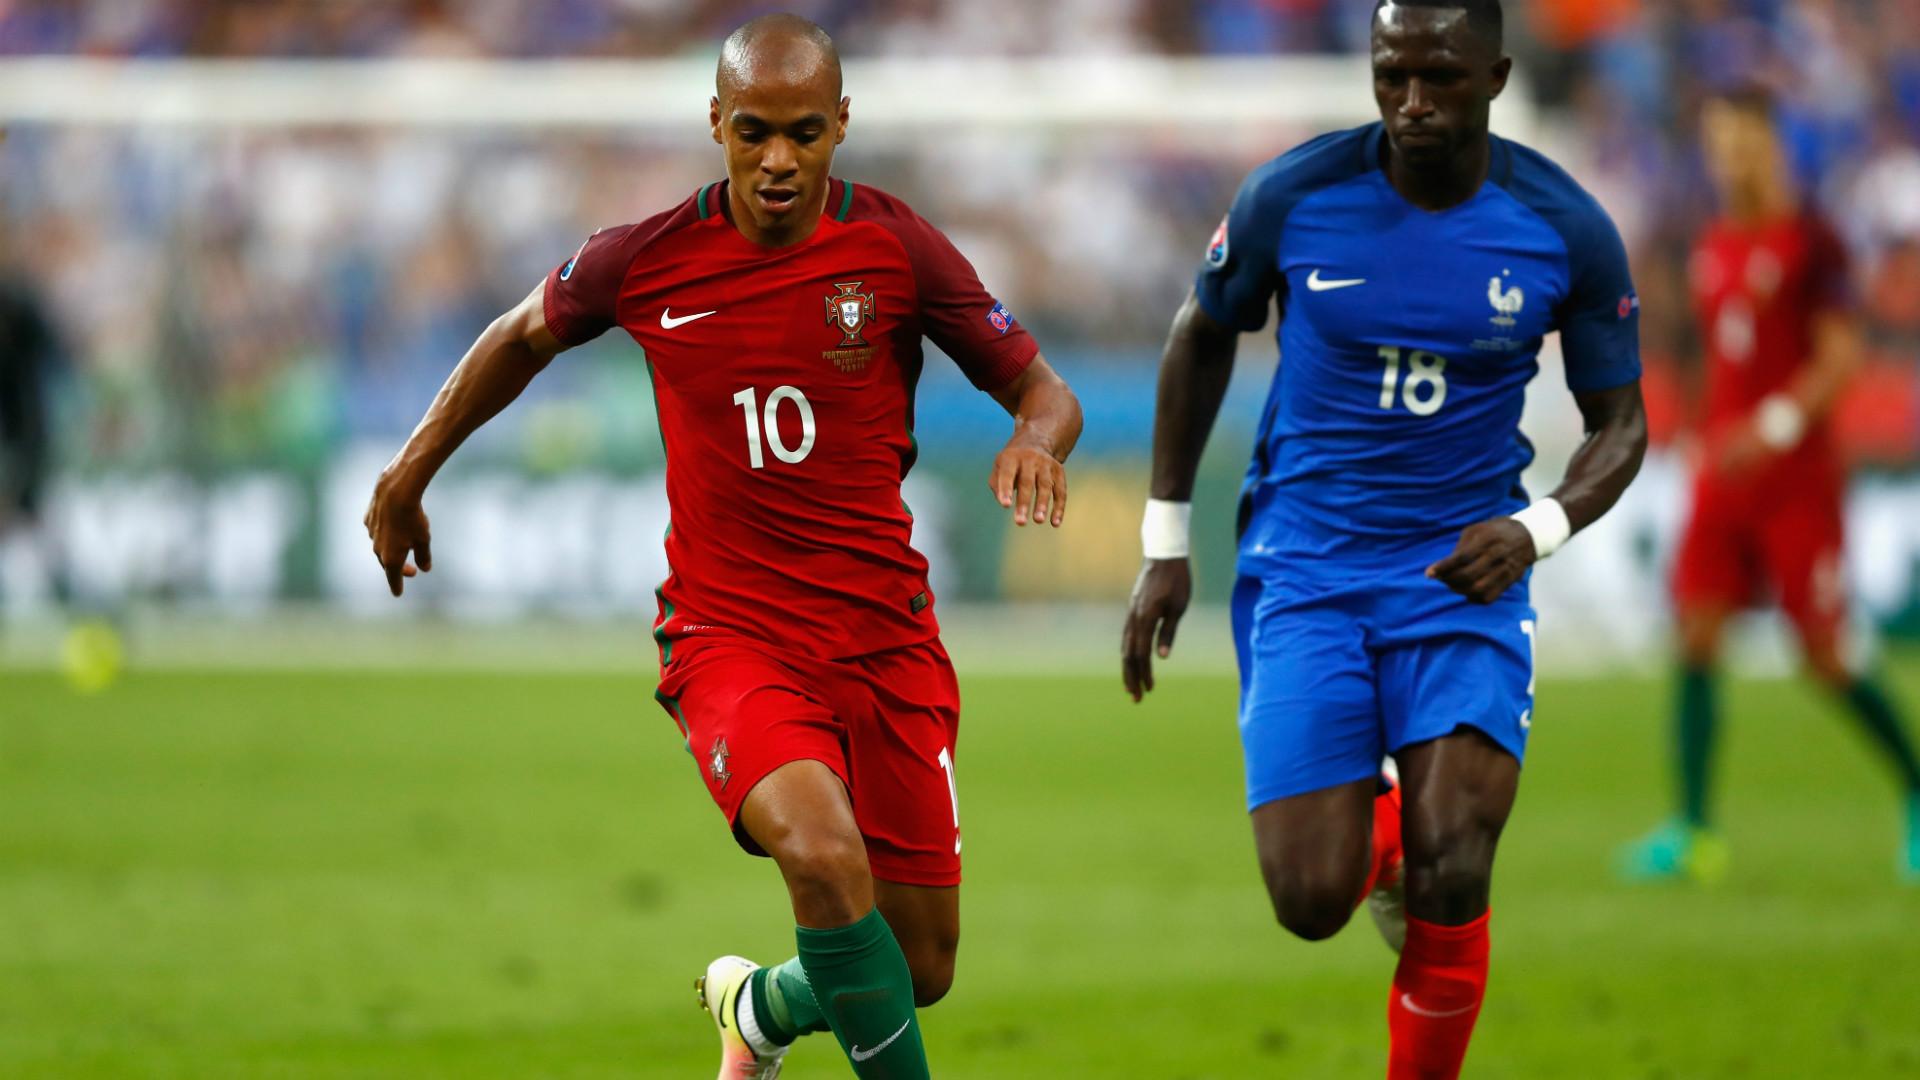 Calciomercato, Inter: Joao Màrio potrebbe arrivare tramite lo Jiangsu